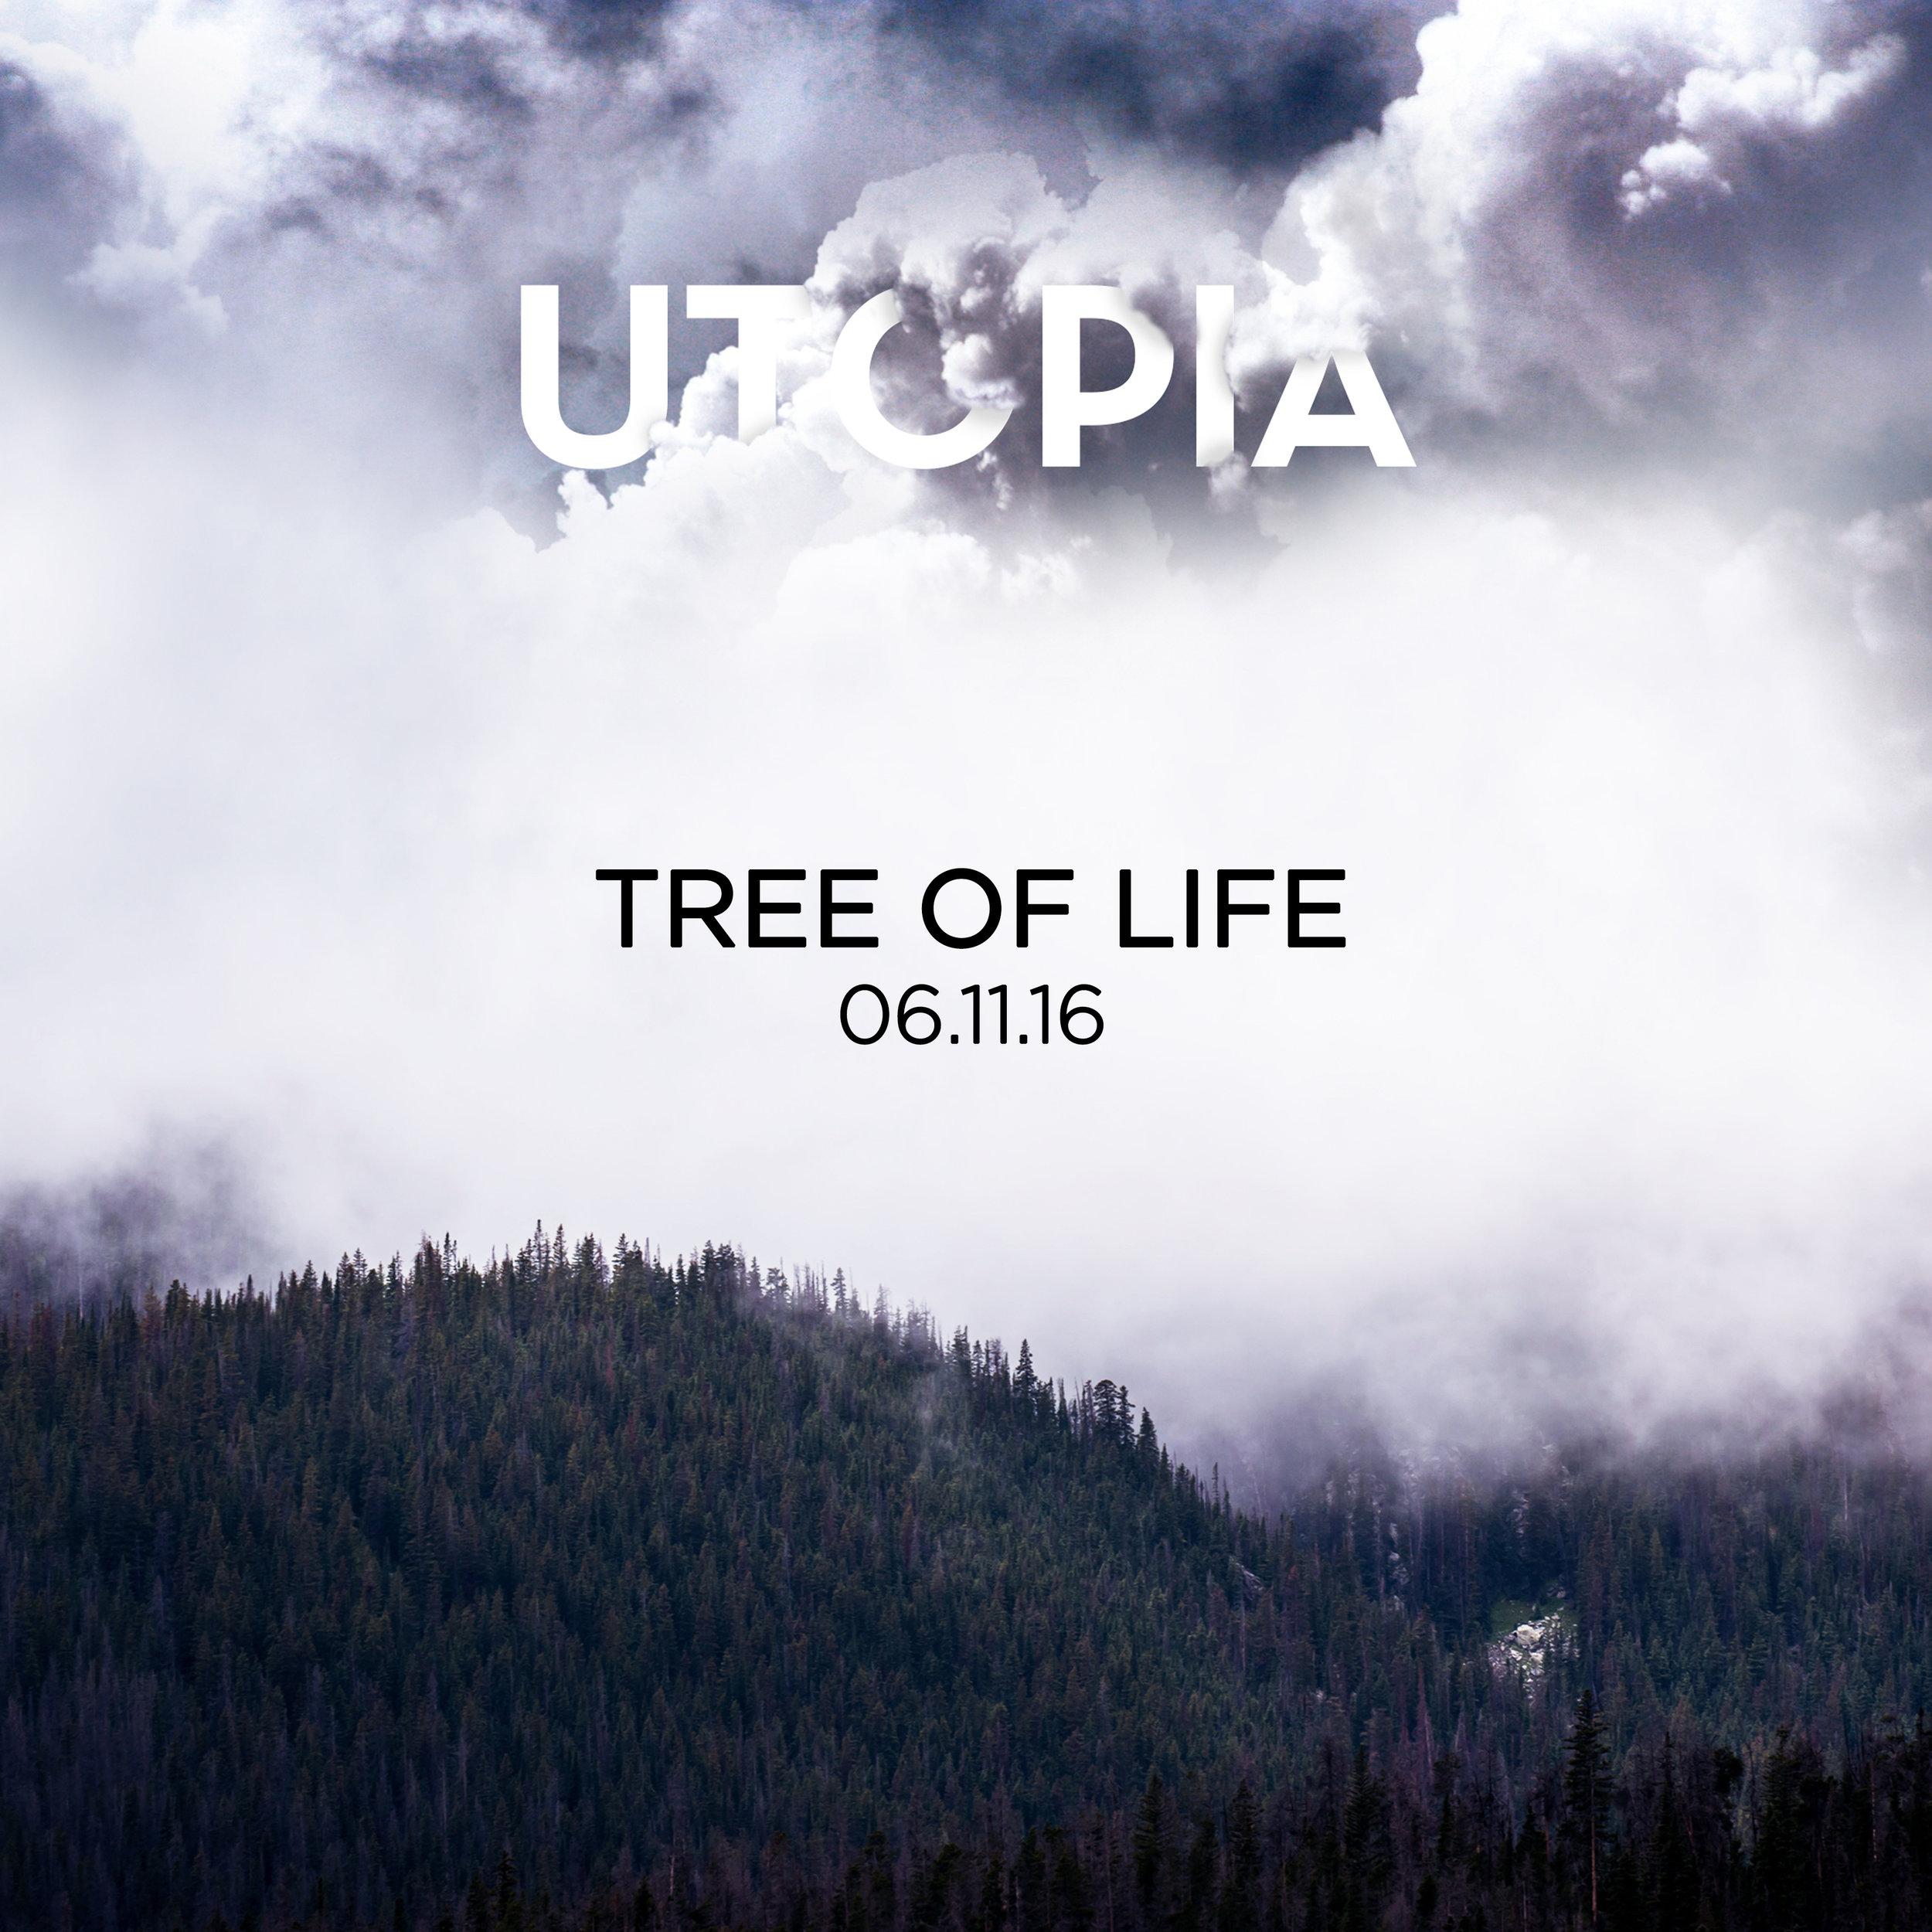 UTOPIA_Insta_Series2.jpg